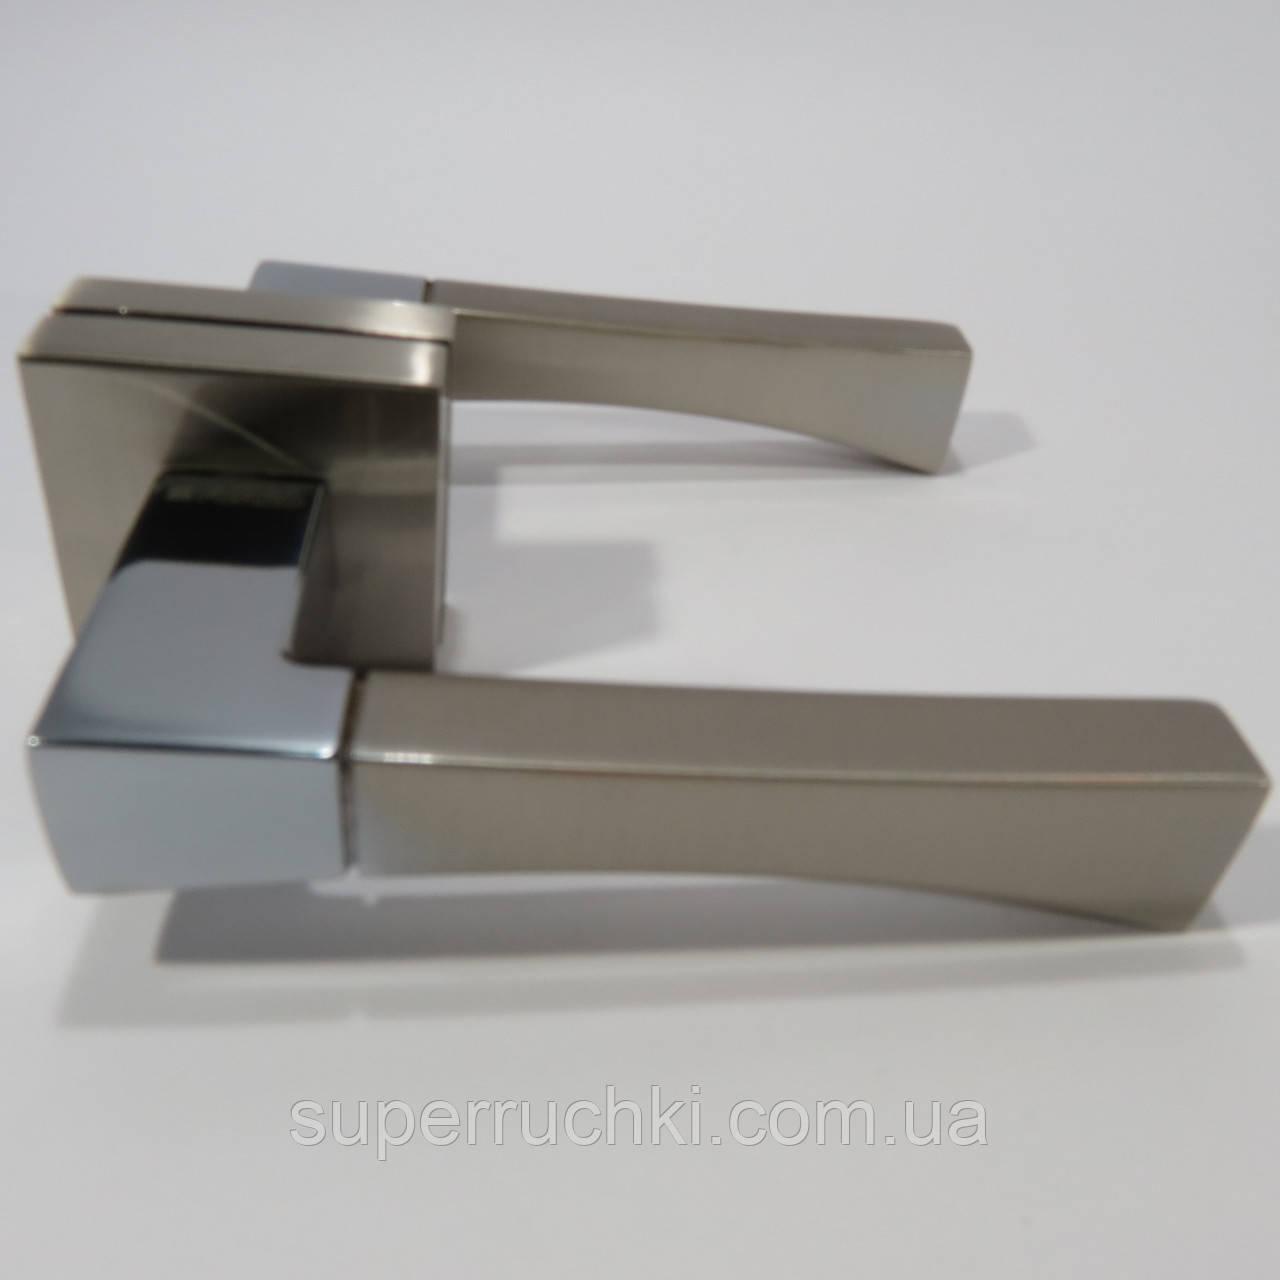 Ручка Fuaro delta  dm sn/cp-3